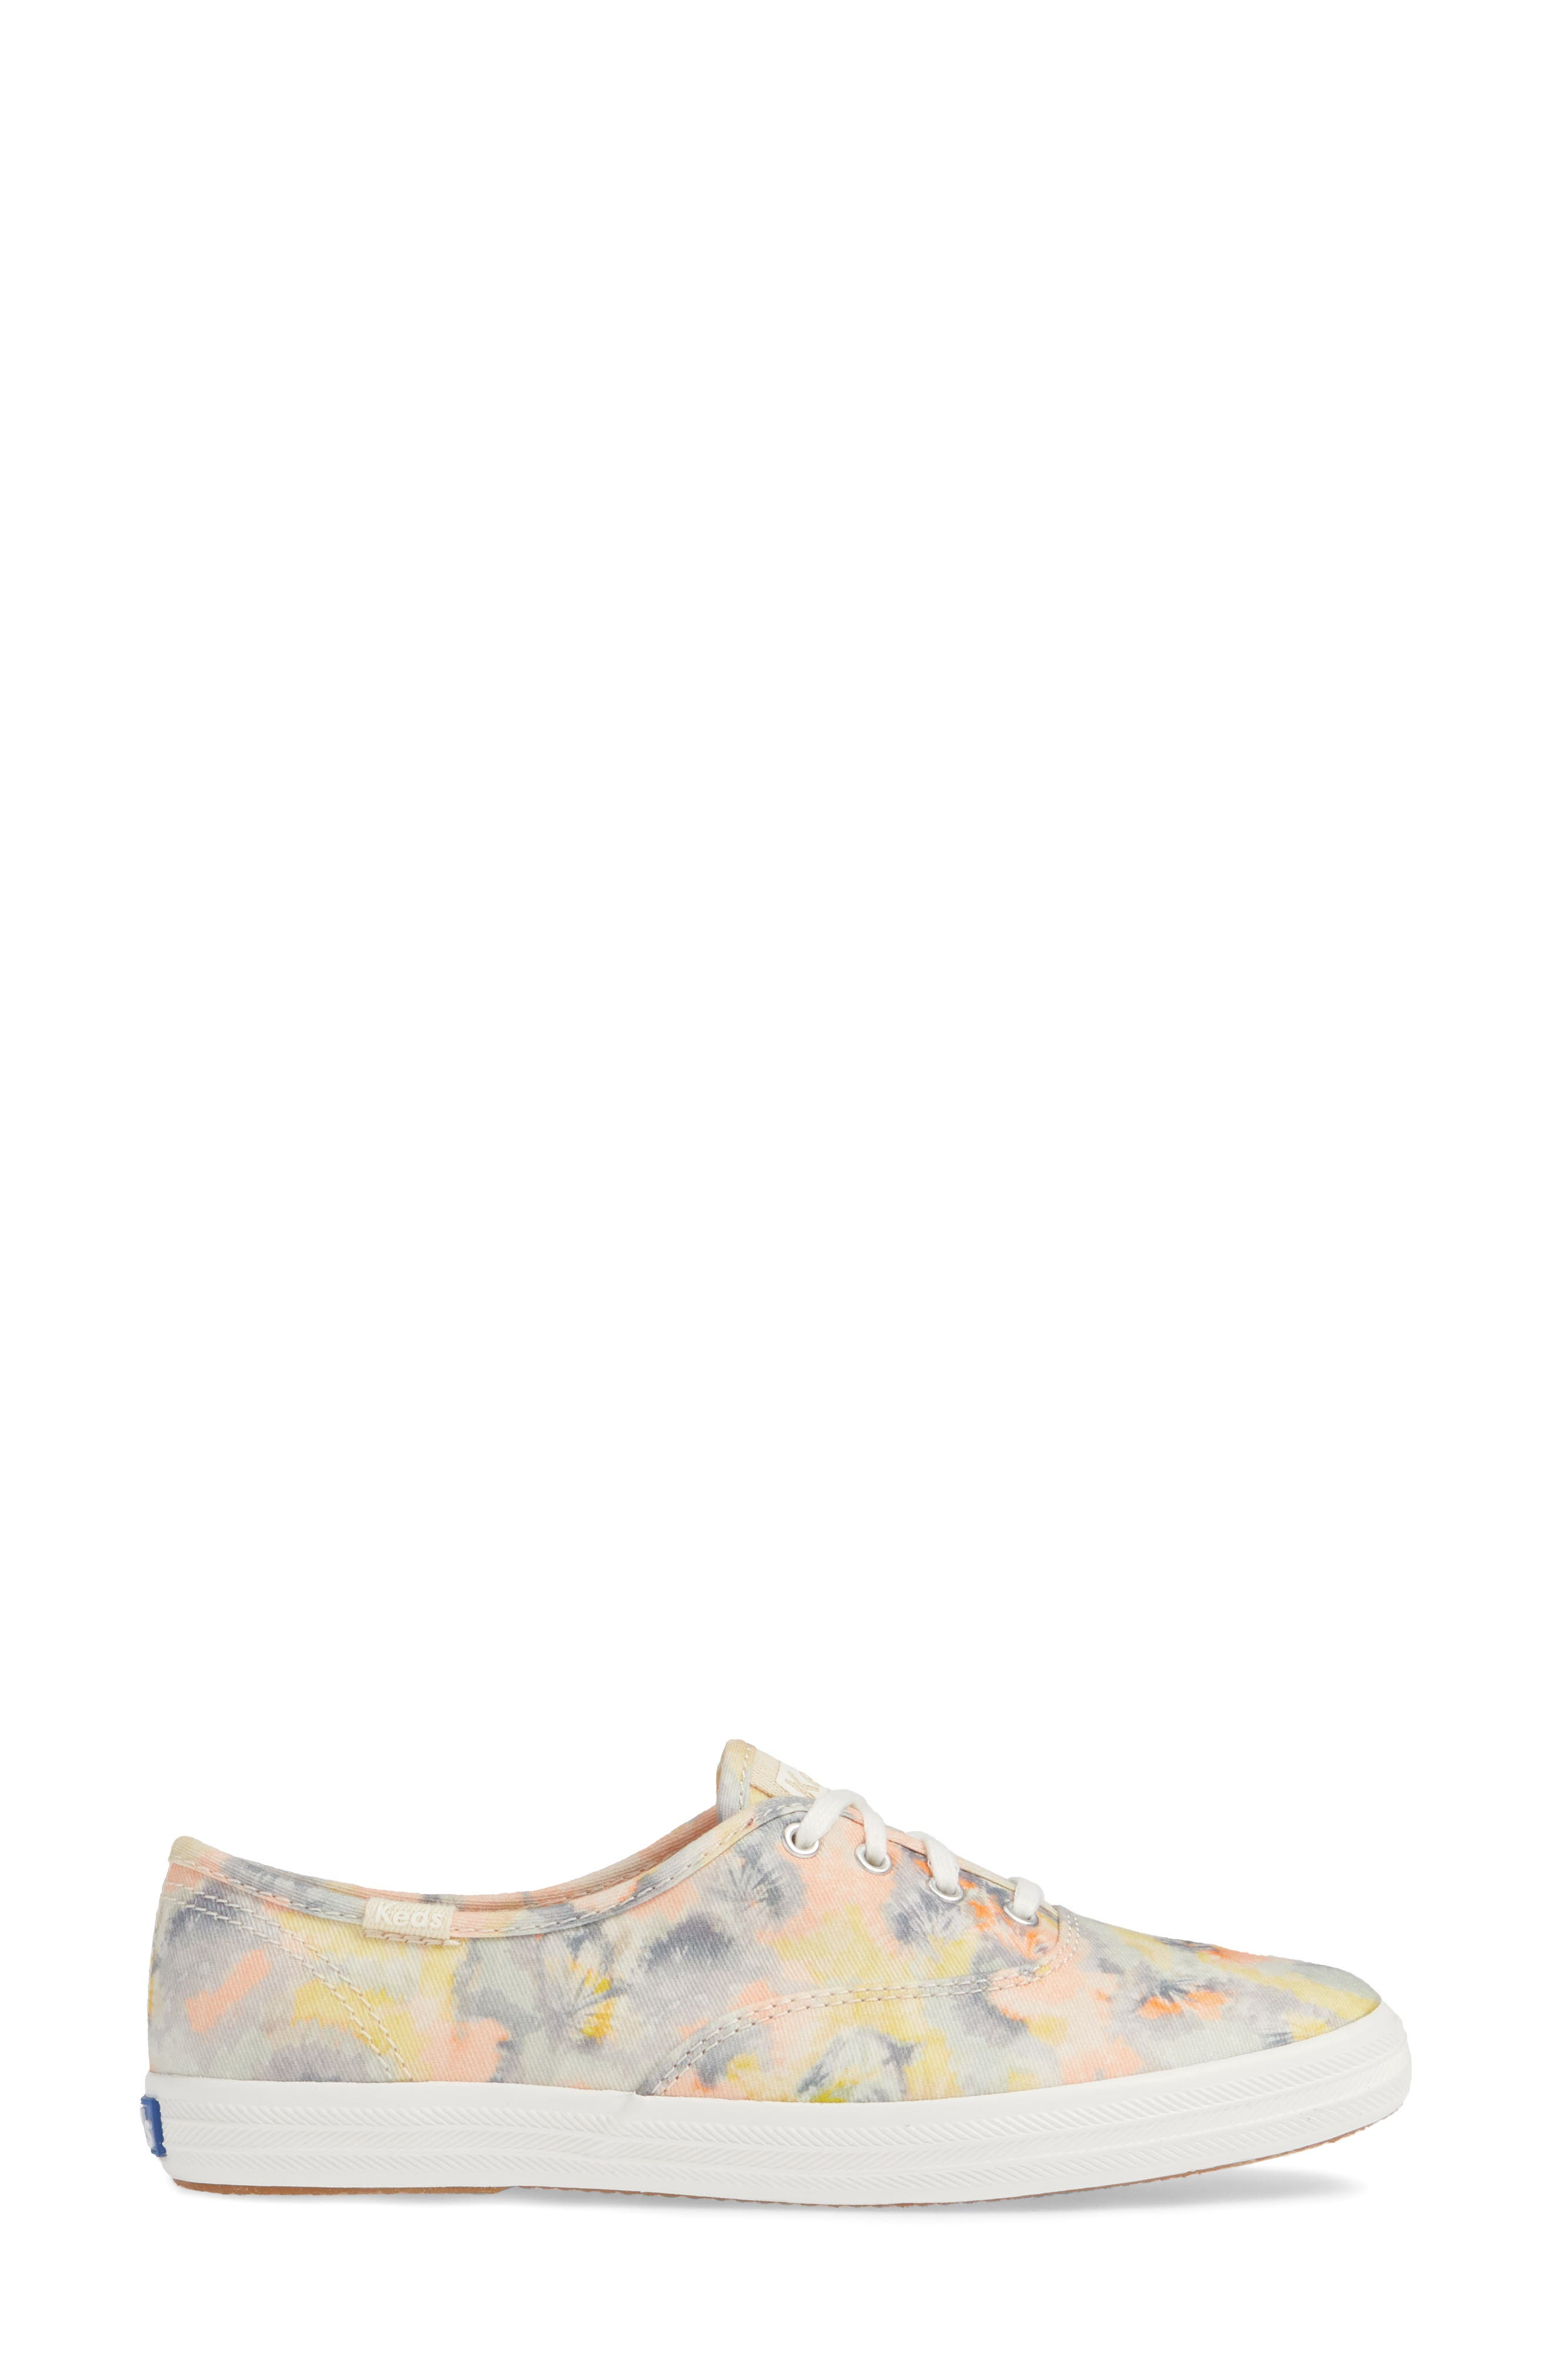 KEDS<SUP>®</SUP>, Champion Tie Dye Sneaker, Alternate thumbnail 3, color, PINK MULTI